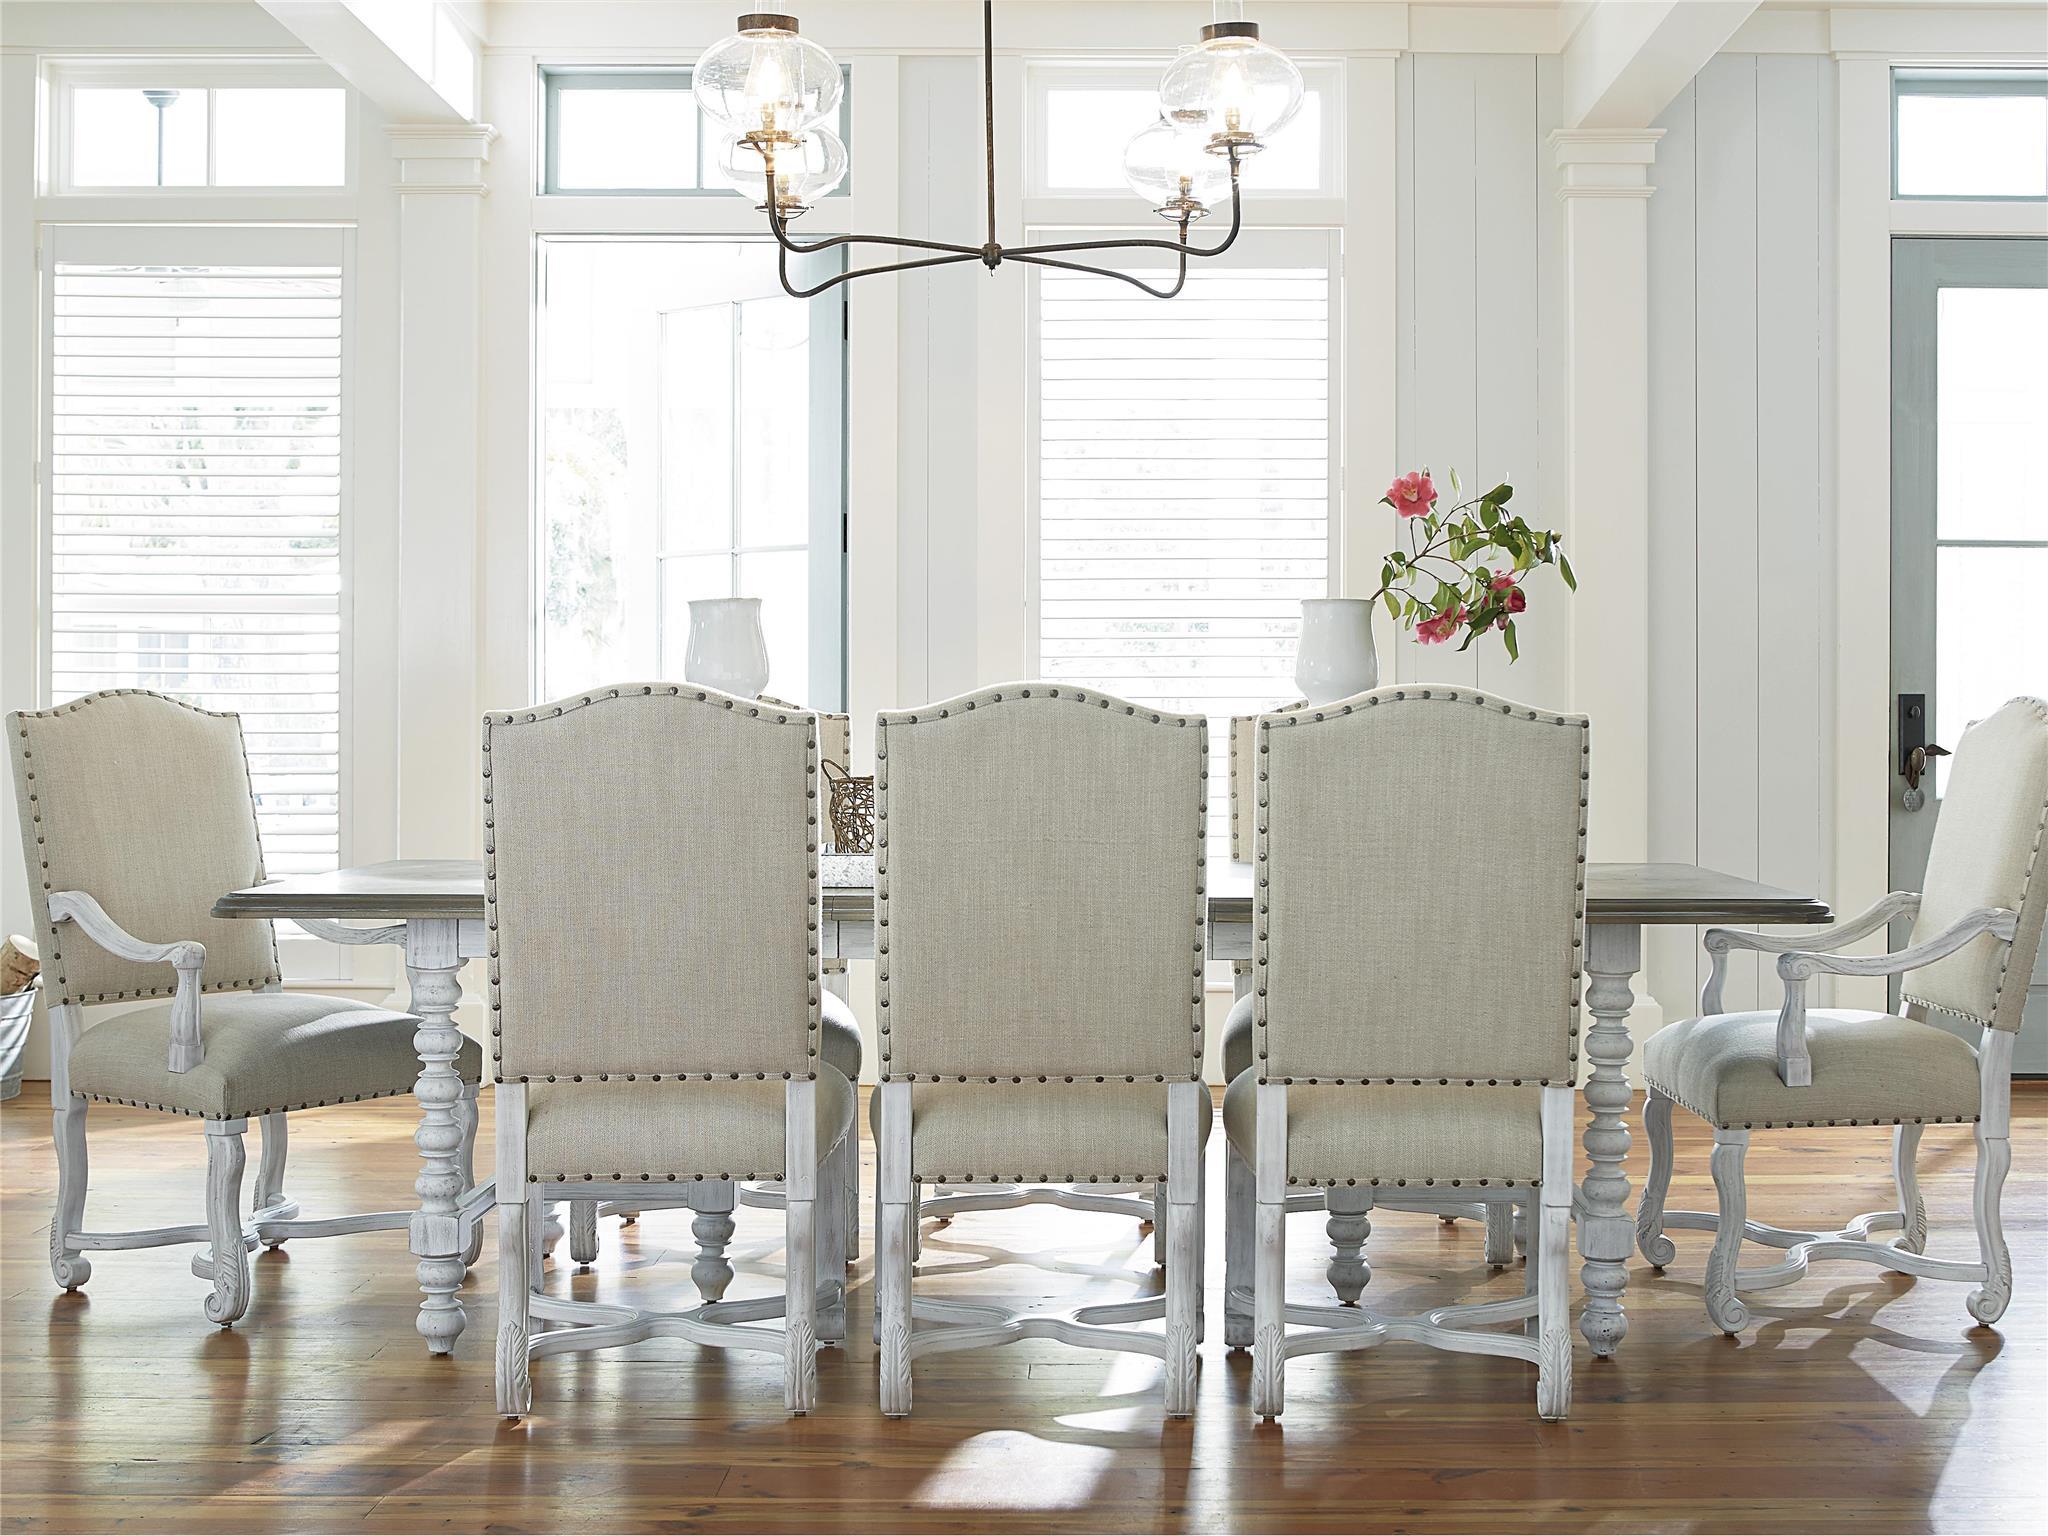 paula deen dogwood dining chairs swing chair size universal furniture home